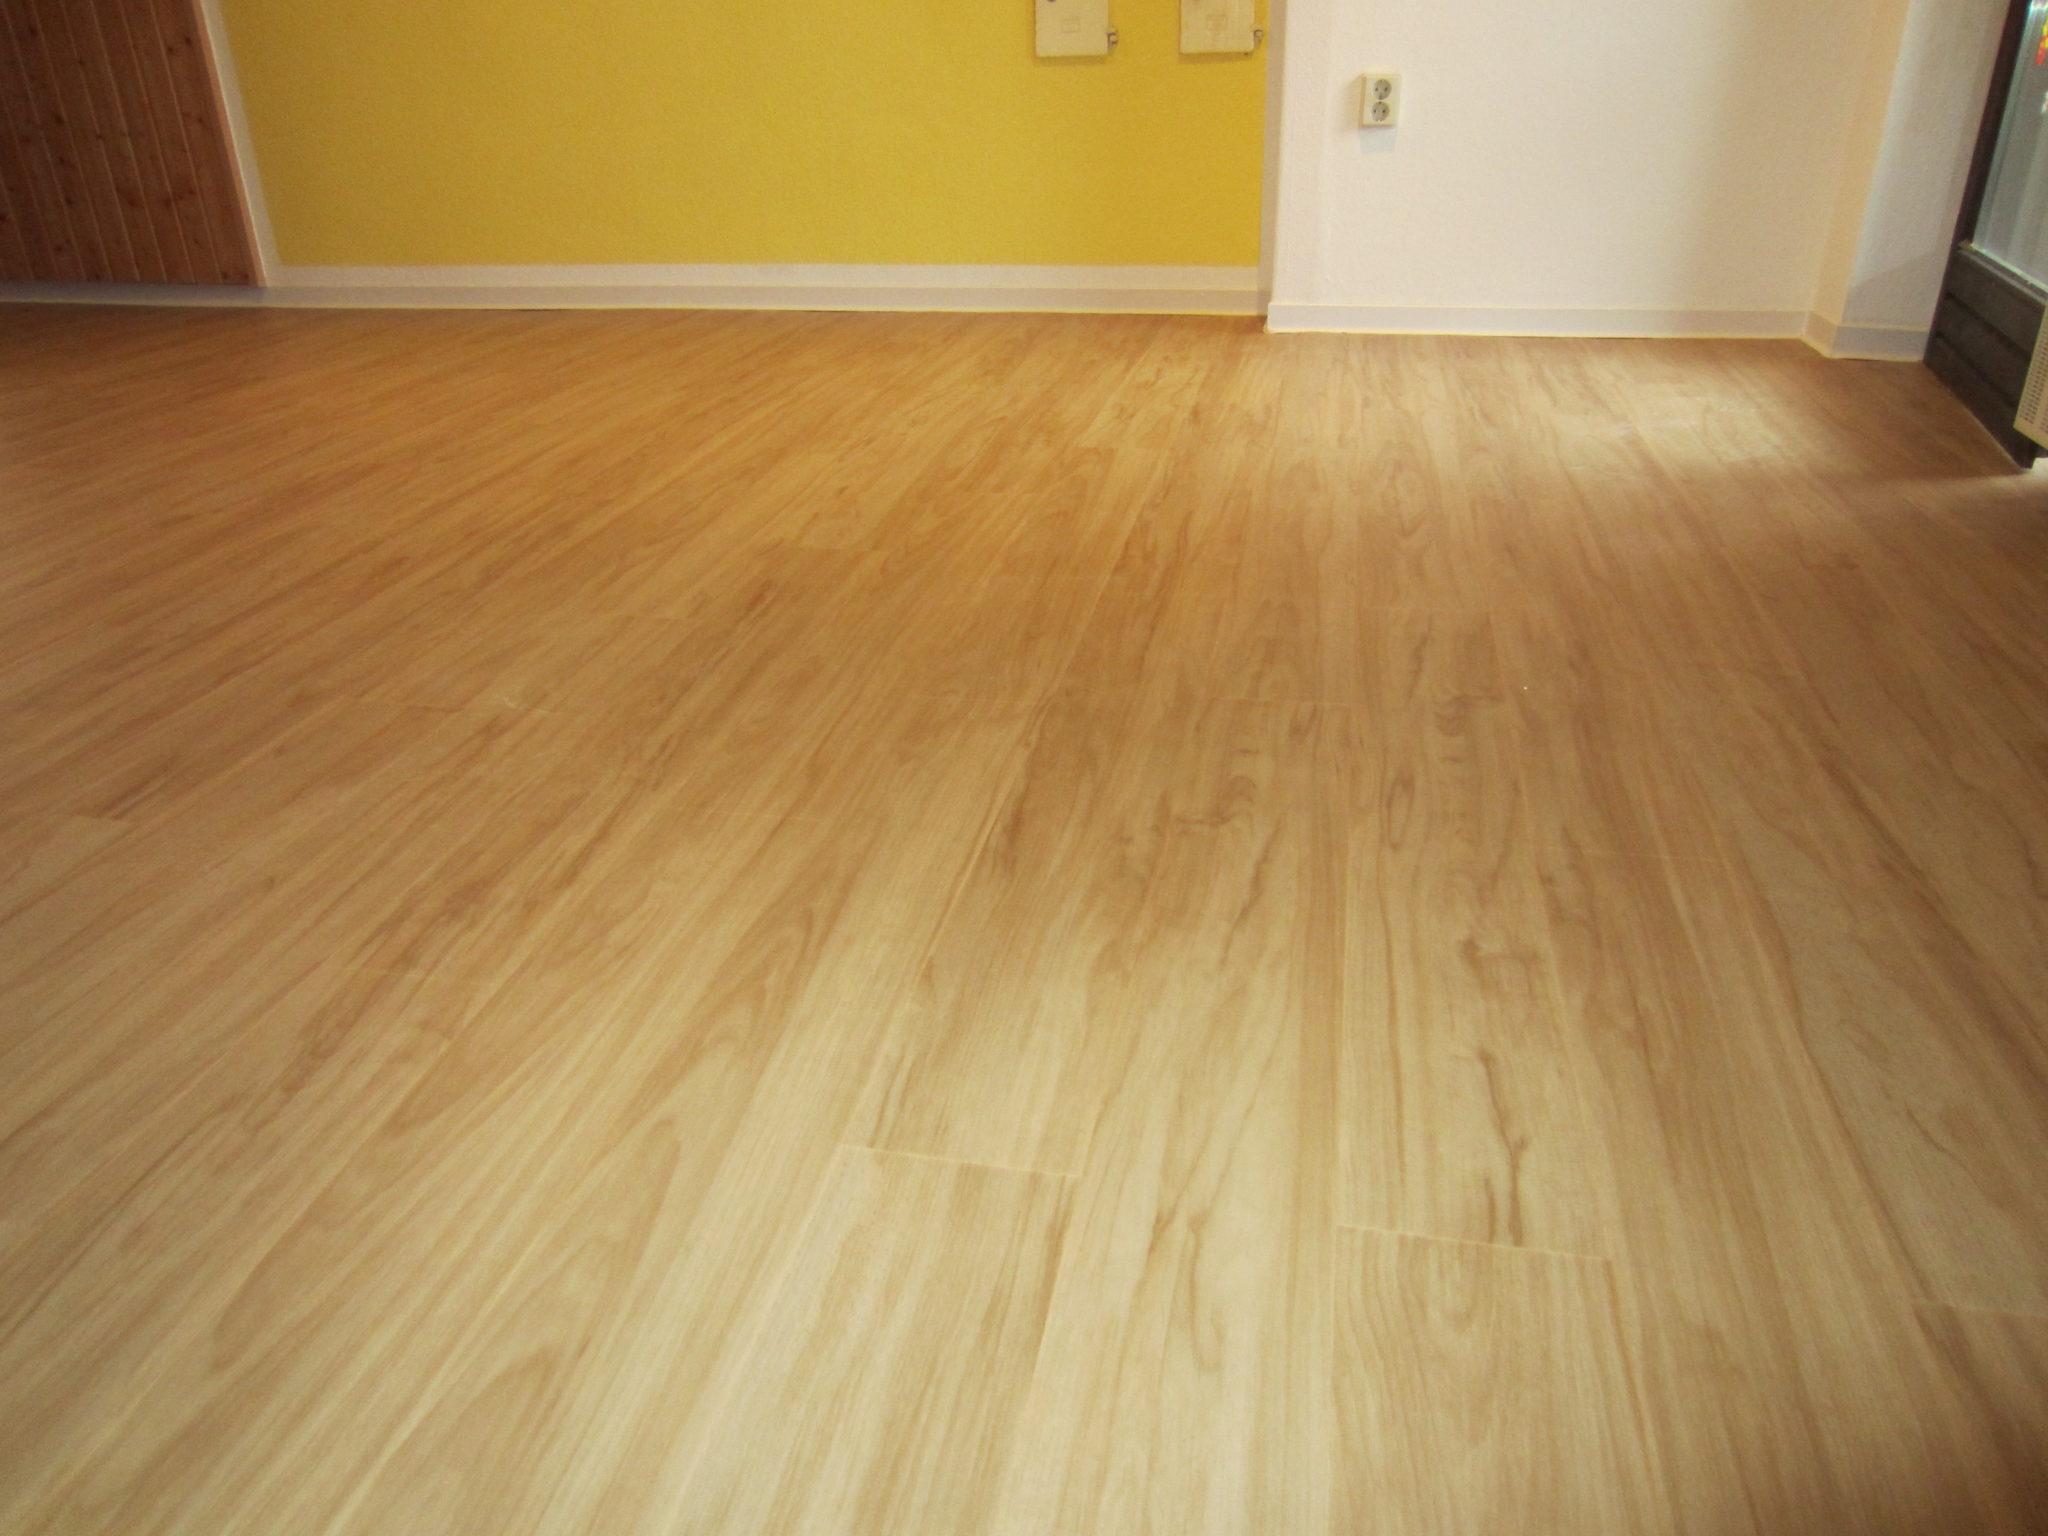 Fußbodenbelag Coburg ~ Bodenbeläge: vinylboden teppichboden parkett & mehr